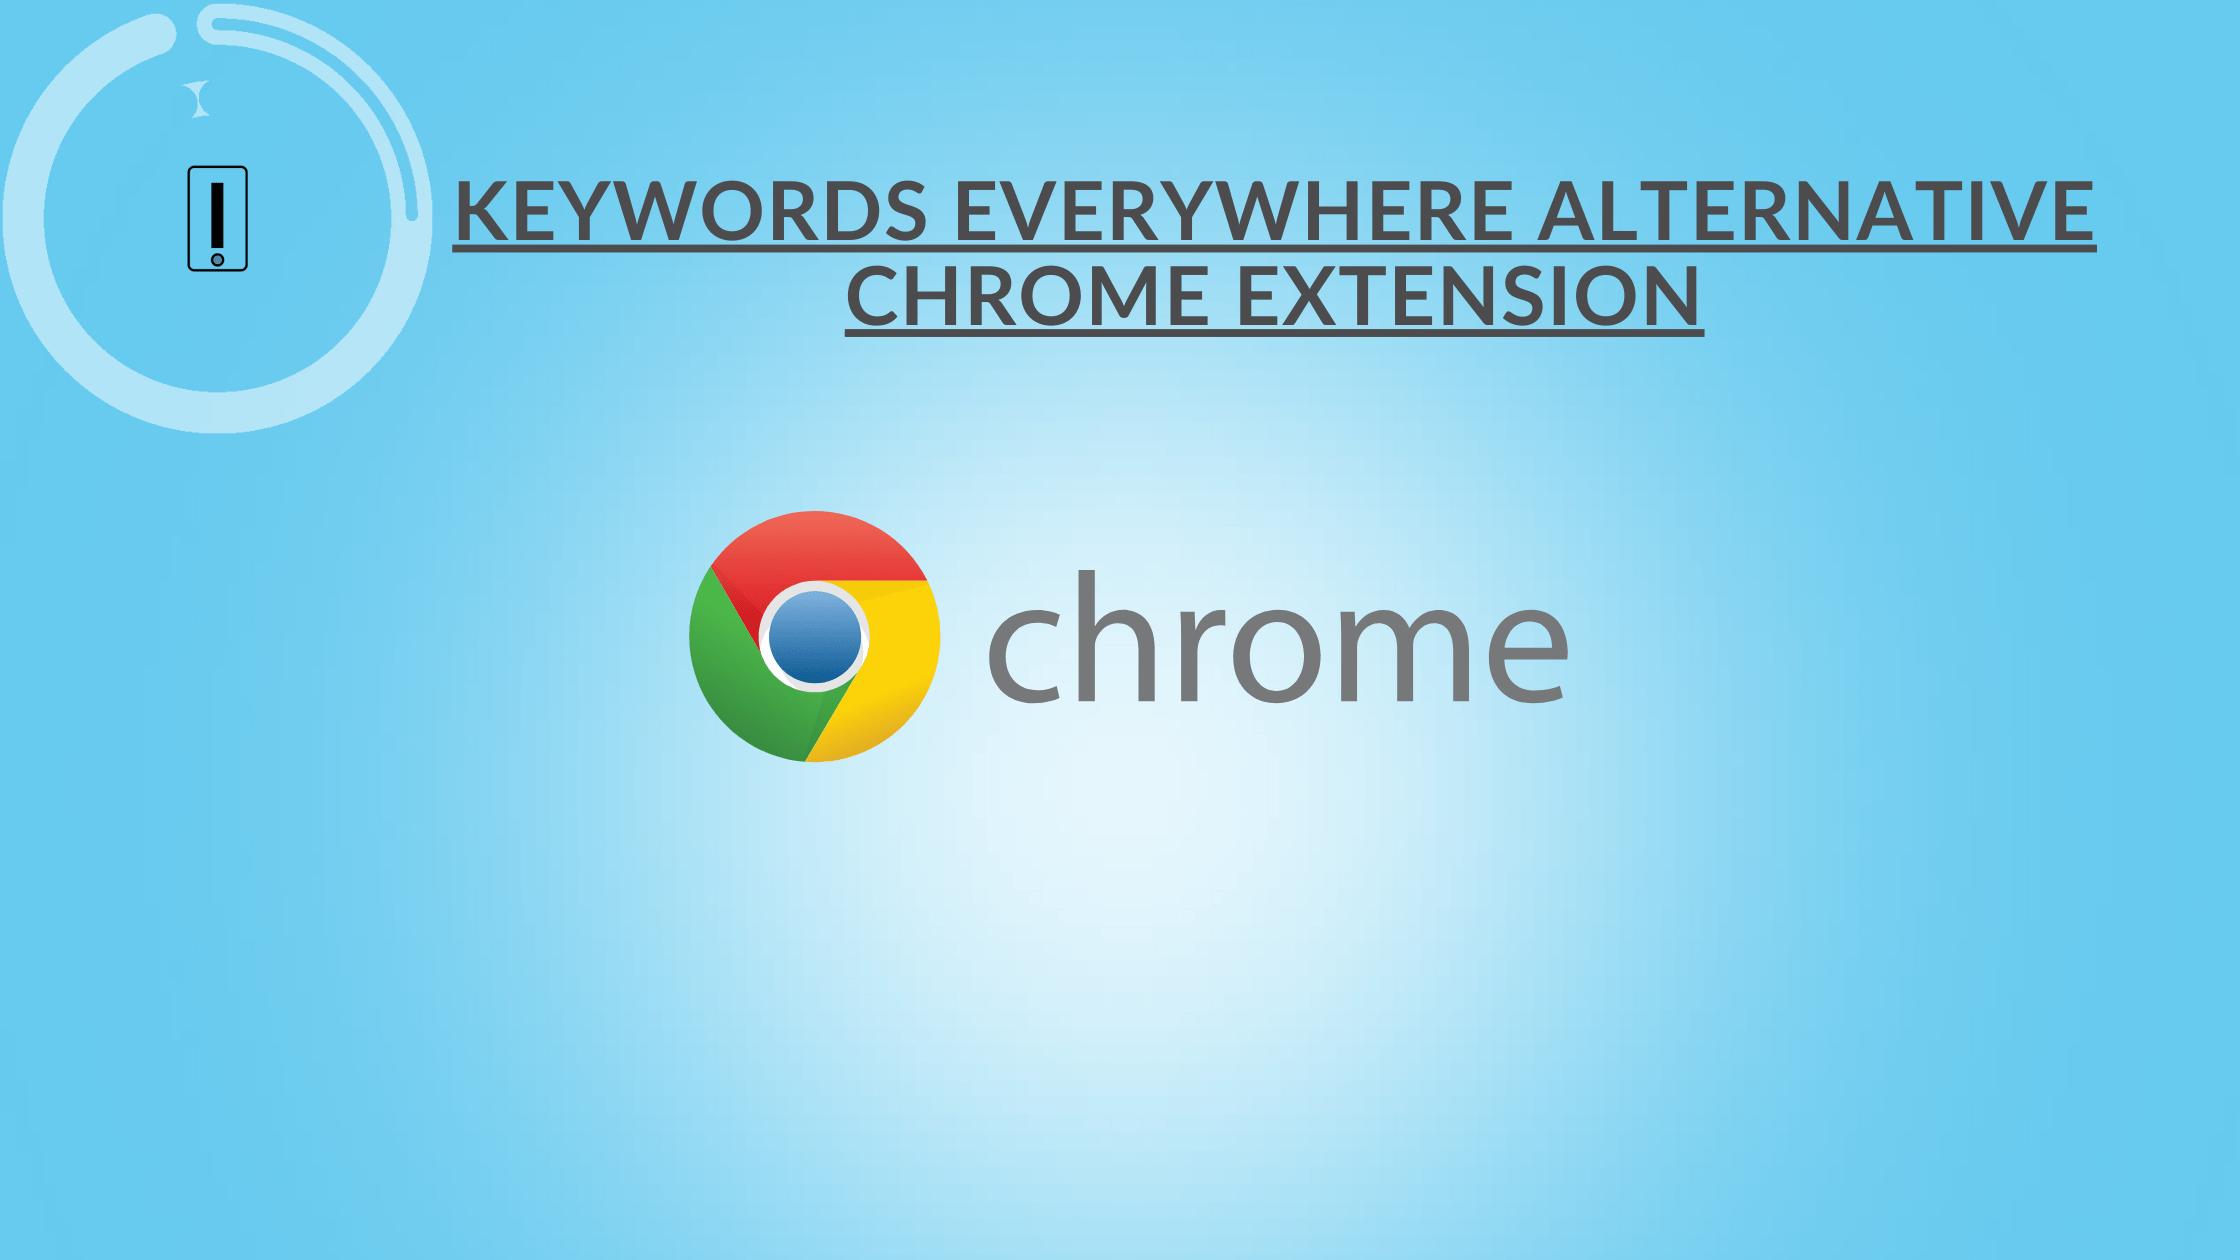 Keywords Everywhere Alternative Chrome Extension WMS Everywhere